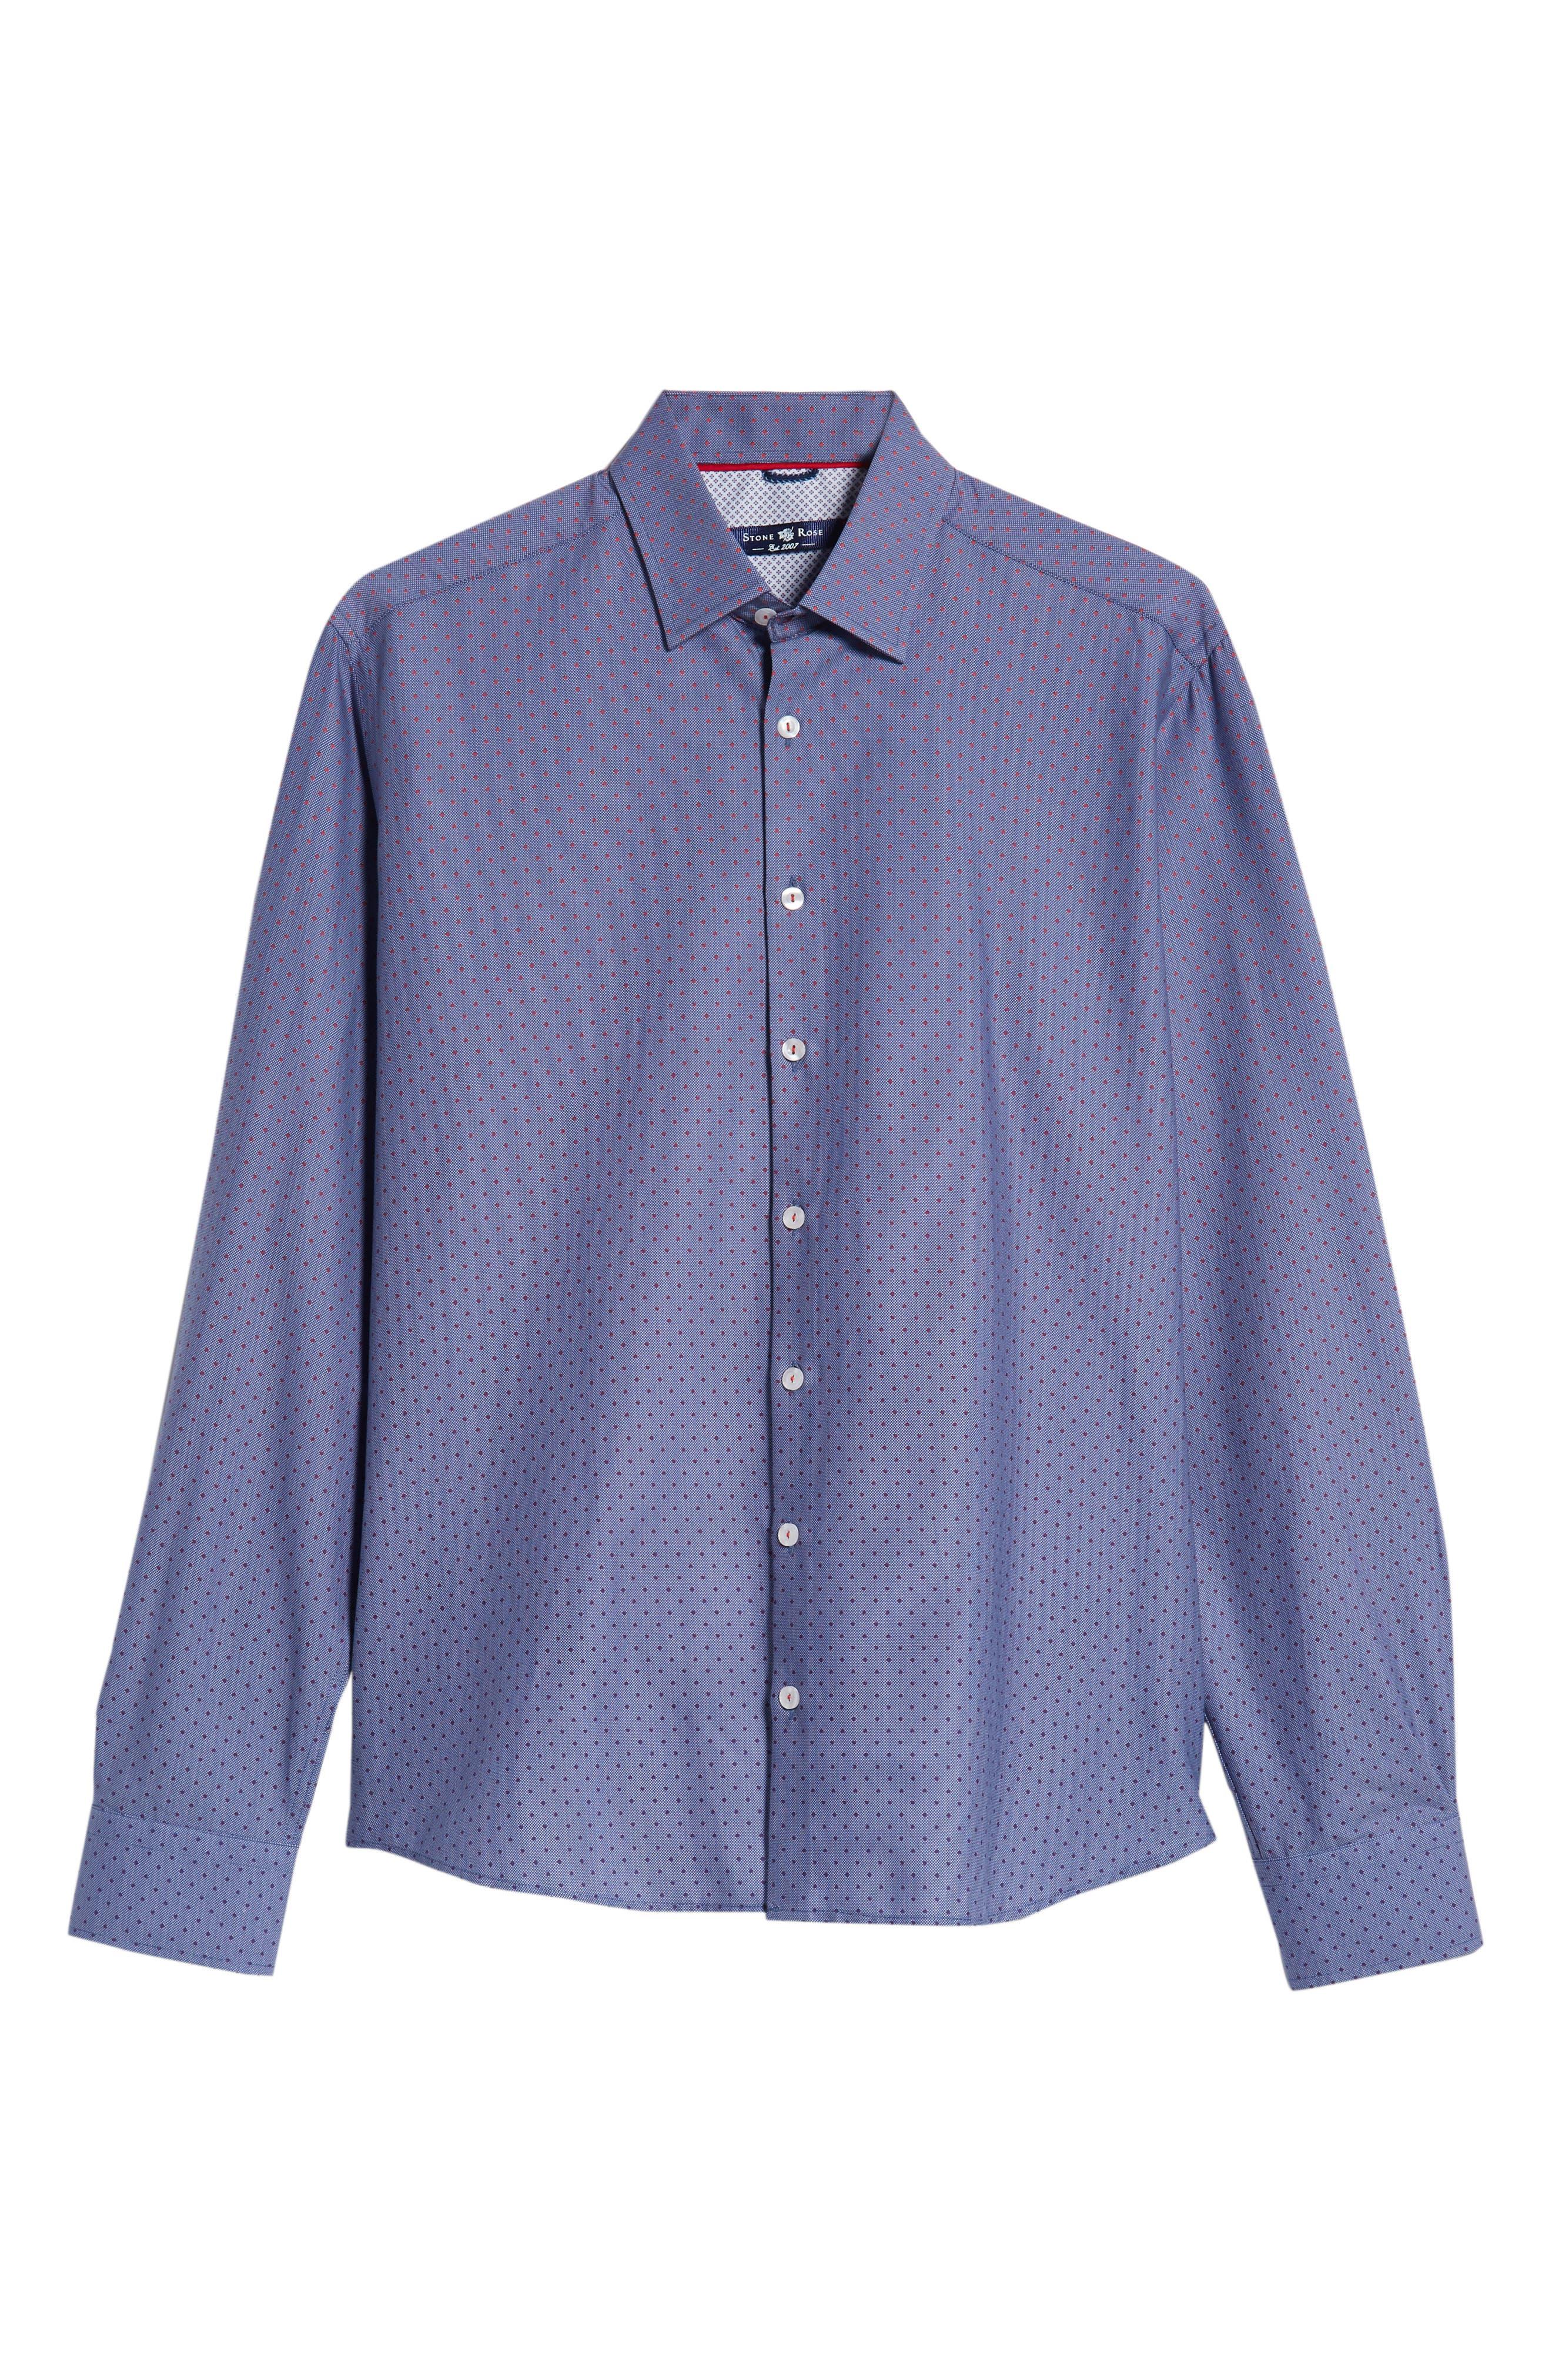 STONE ROSE,                             Gradient Dot Regular Fit Sport Shirt,                             Alternate thumbnail 5, color,                             400